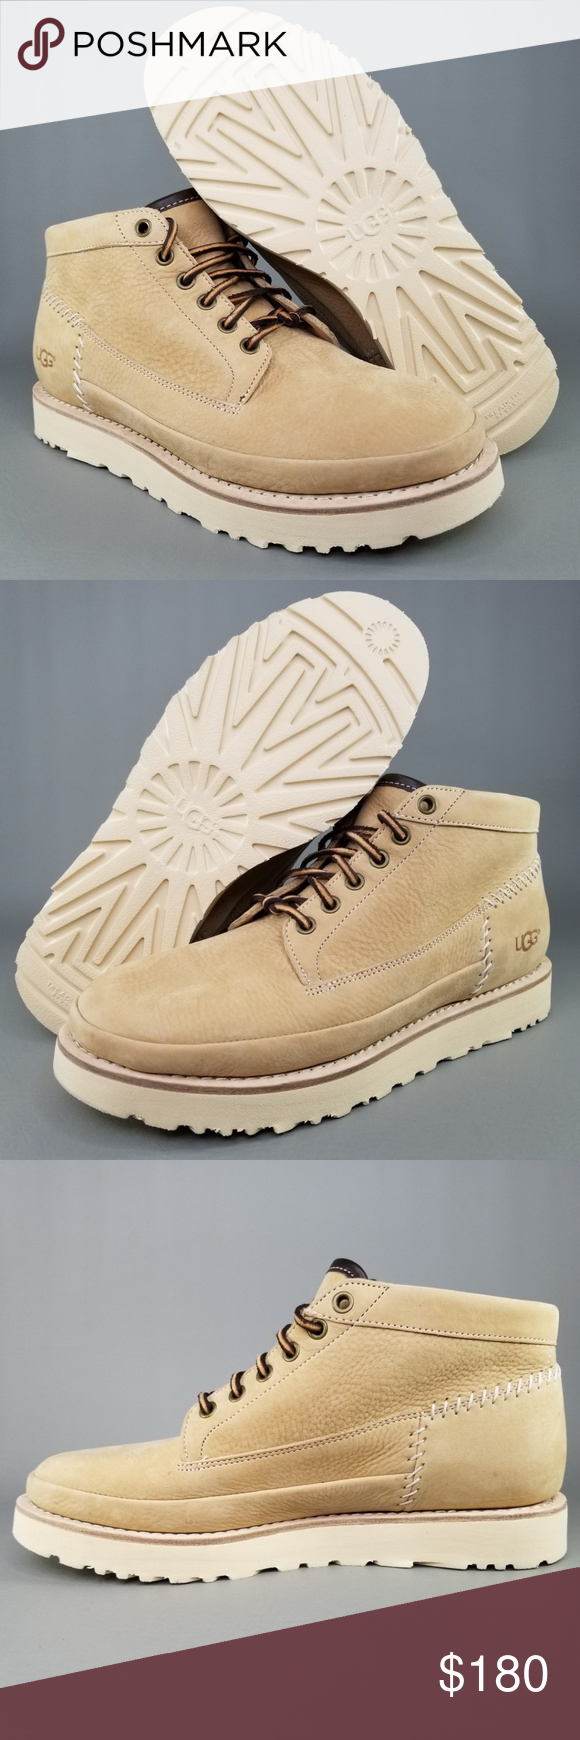 f1941b855d2 UGG Australia Men's Campfire Trail Leather Boots UGG Australia Men's ...